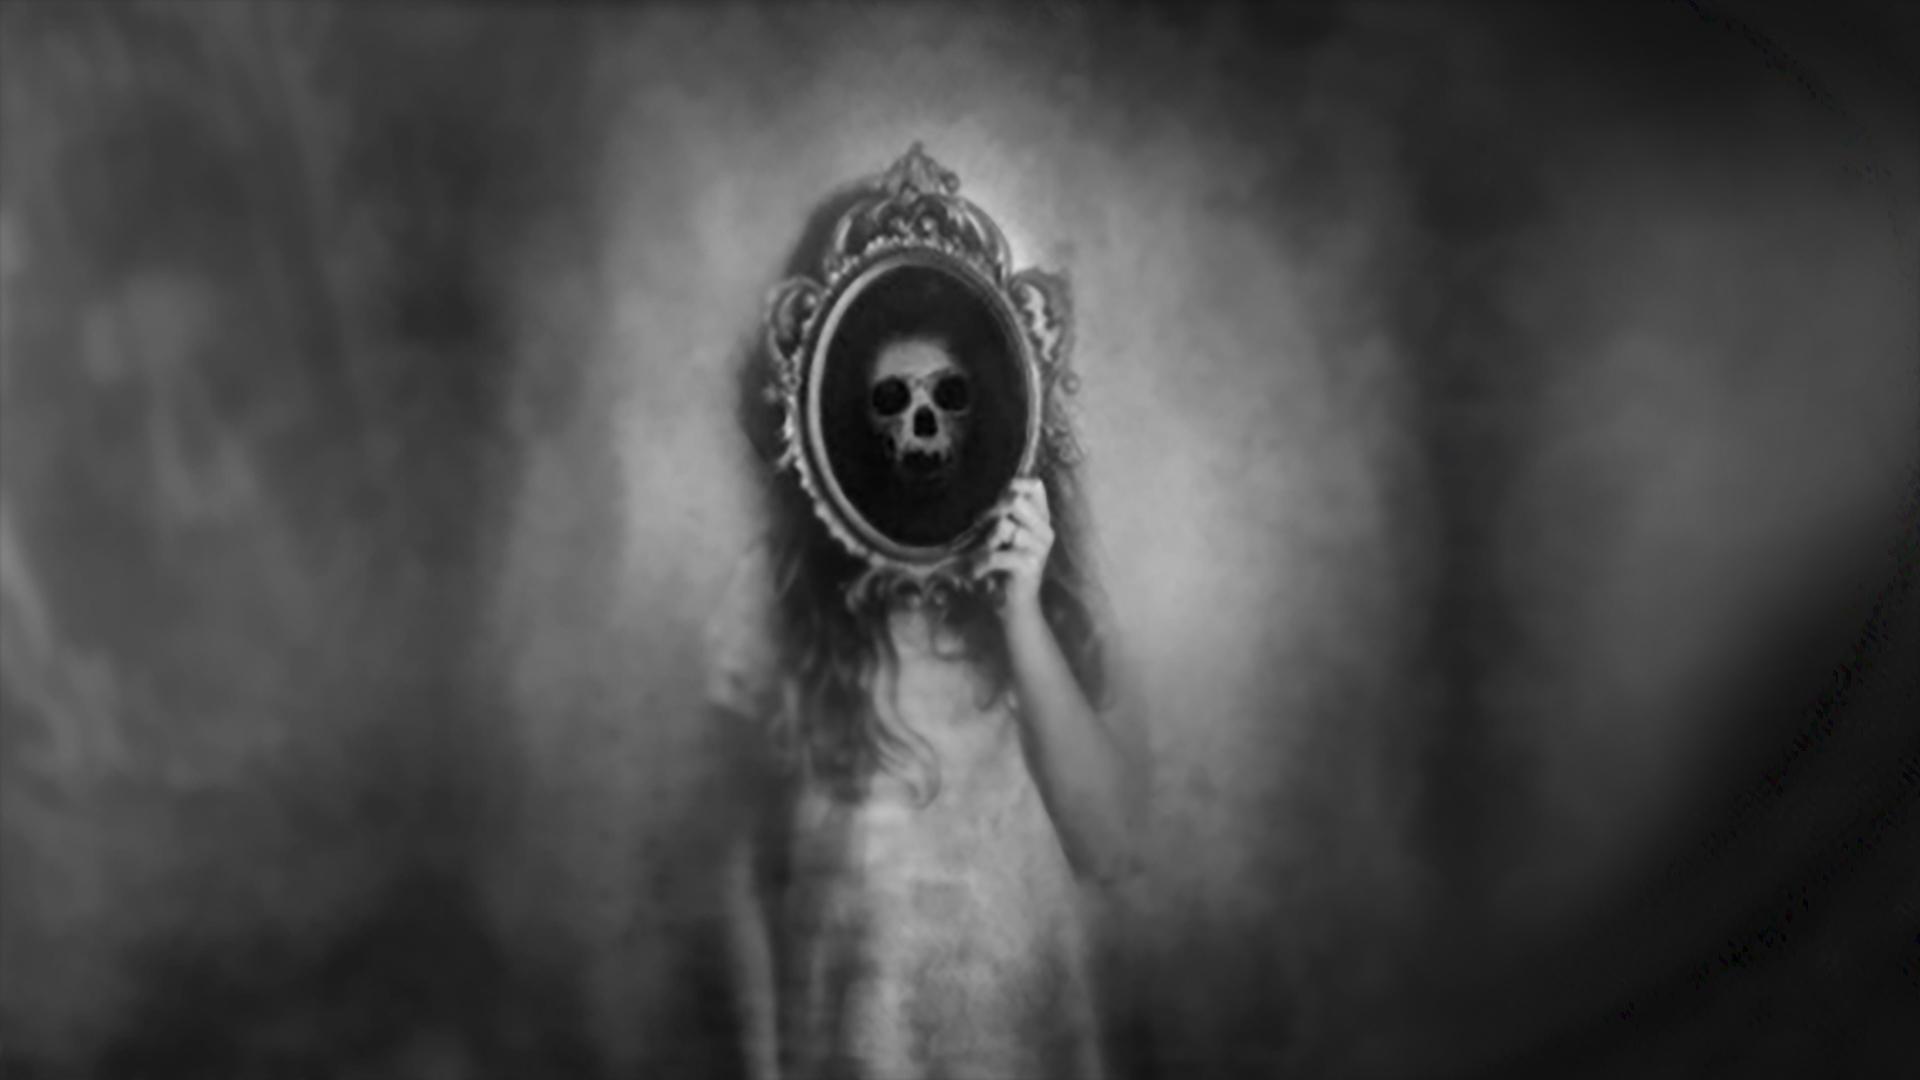 Mirror By Paparapa1980 On DeviantArt